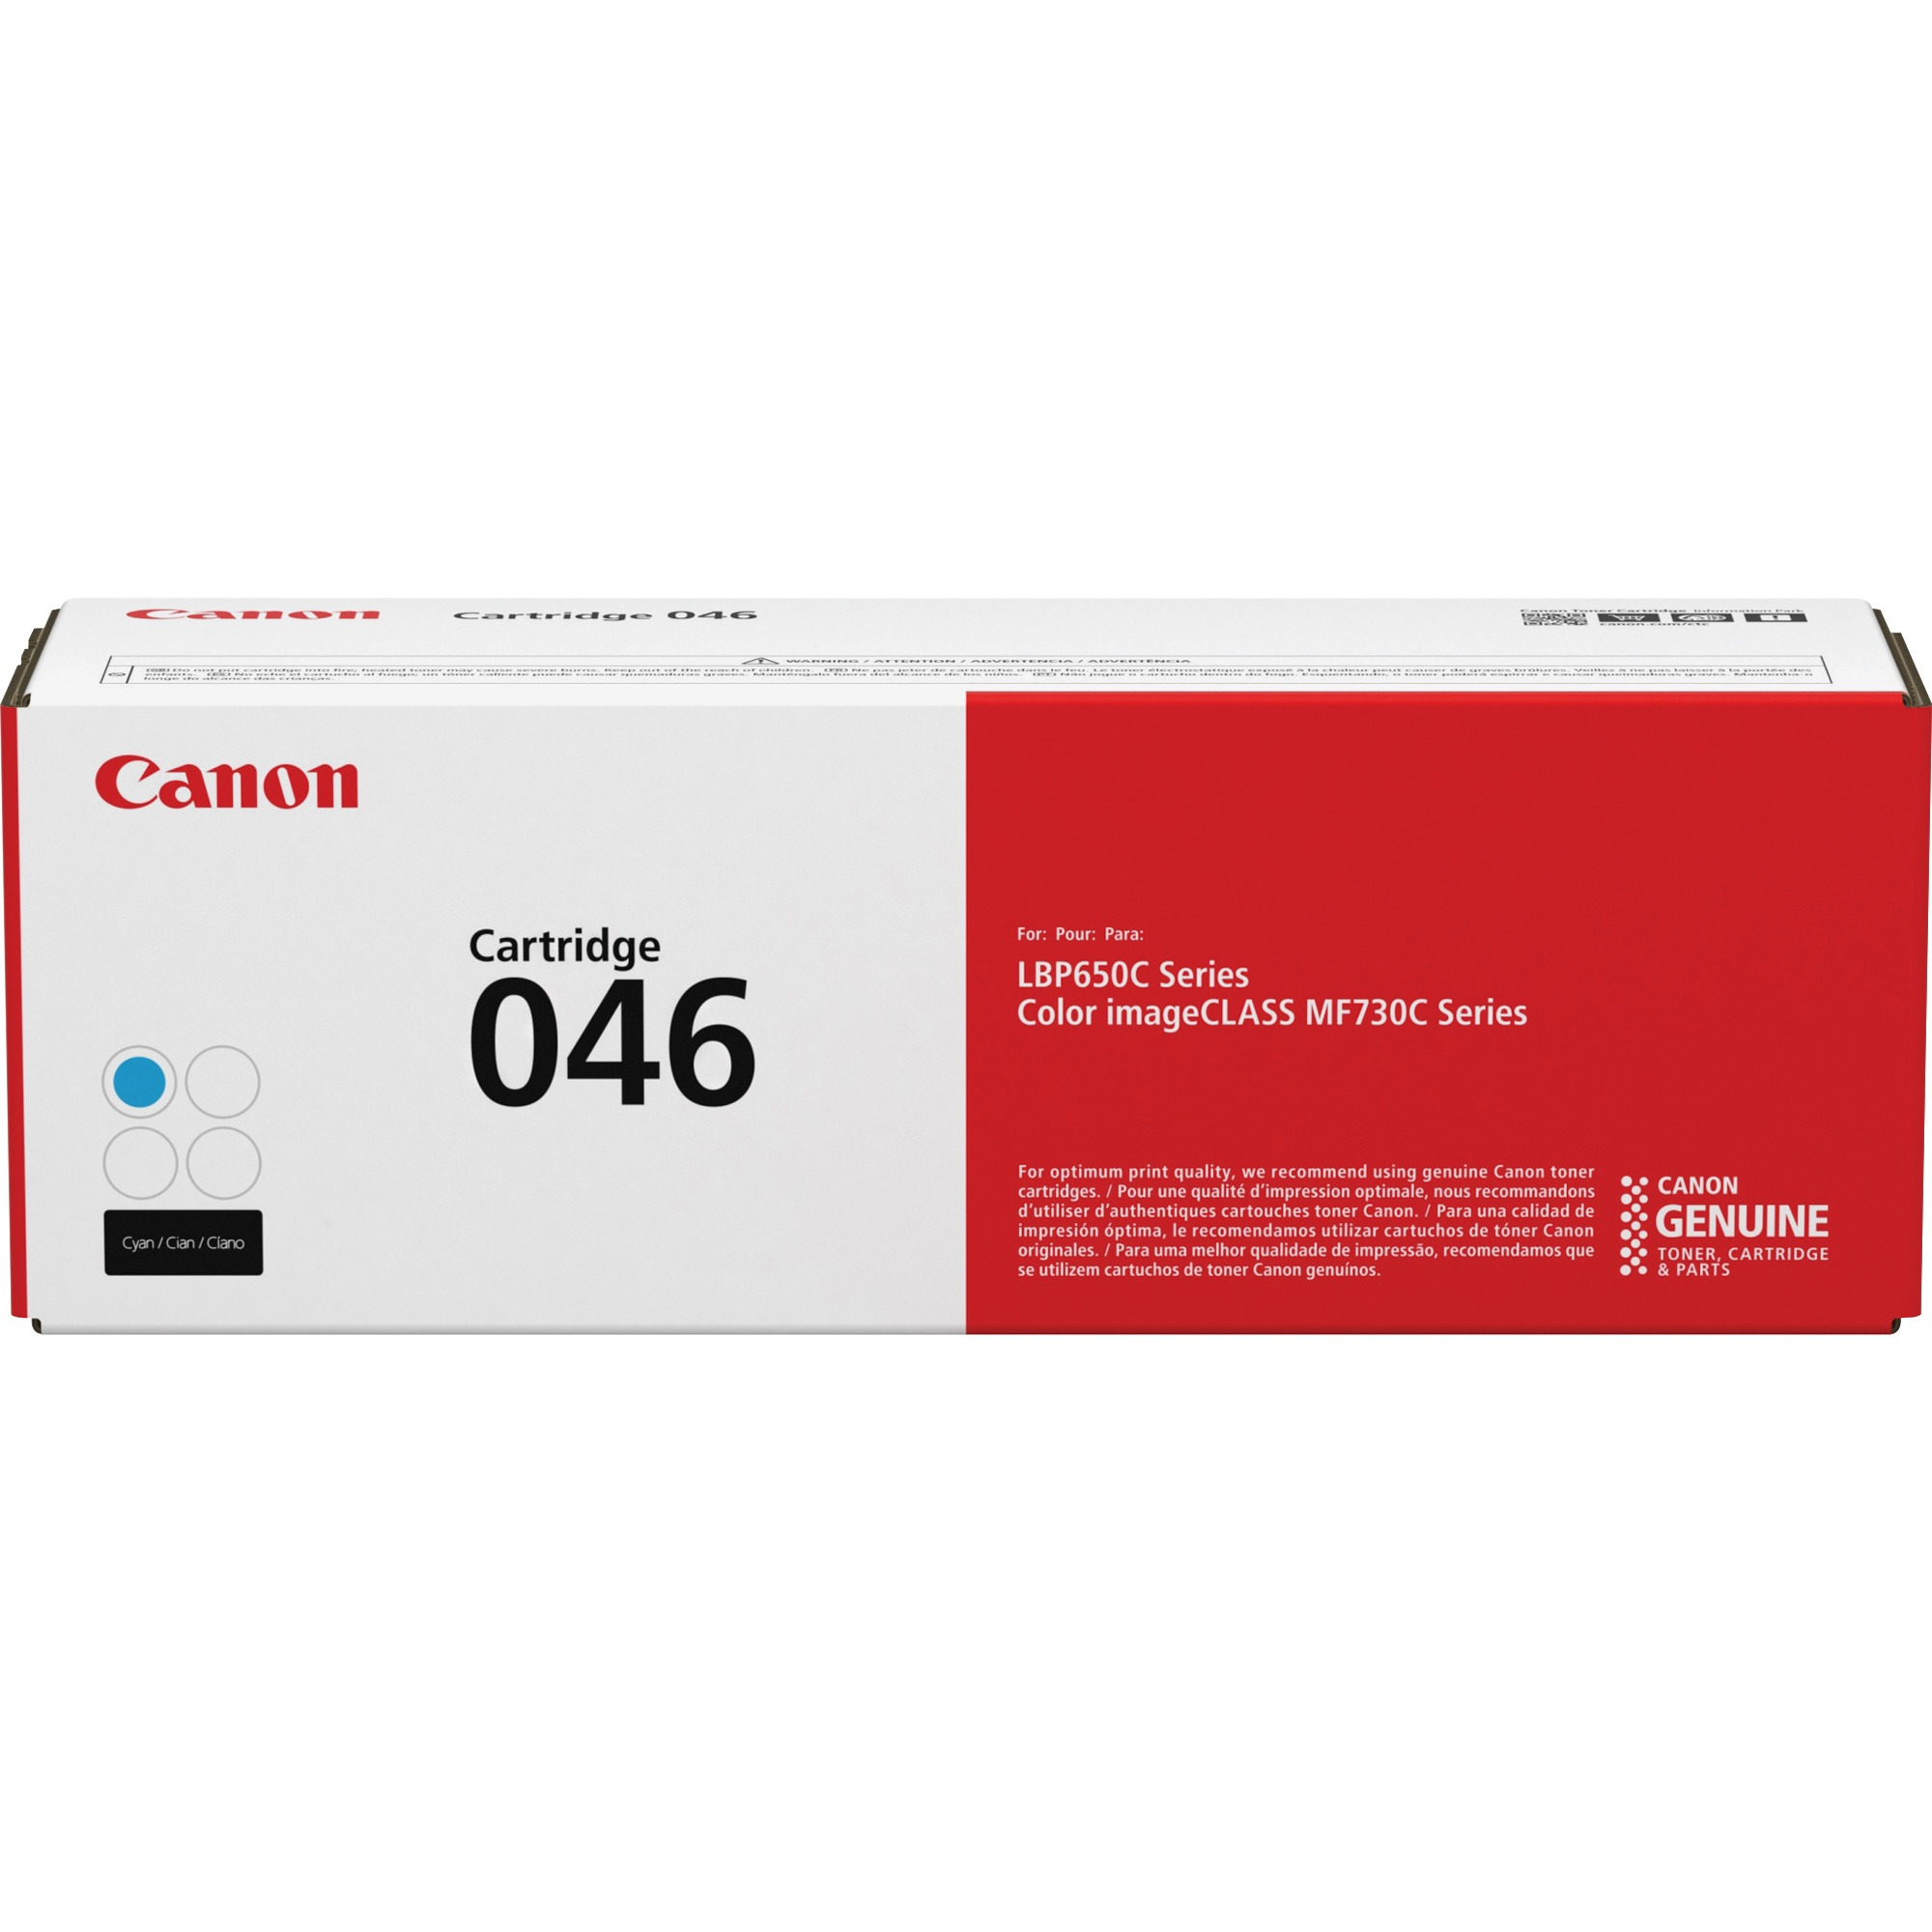 Canon, CNMCRTDG046C, Cartridge 046 Standard Toner Cartridge, 1 Each